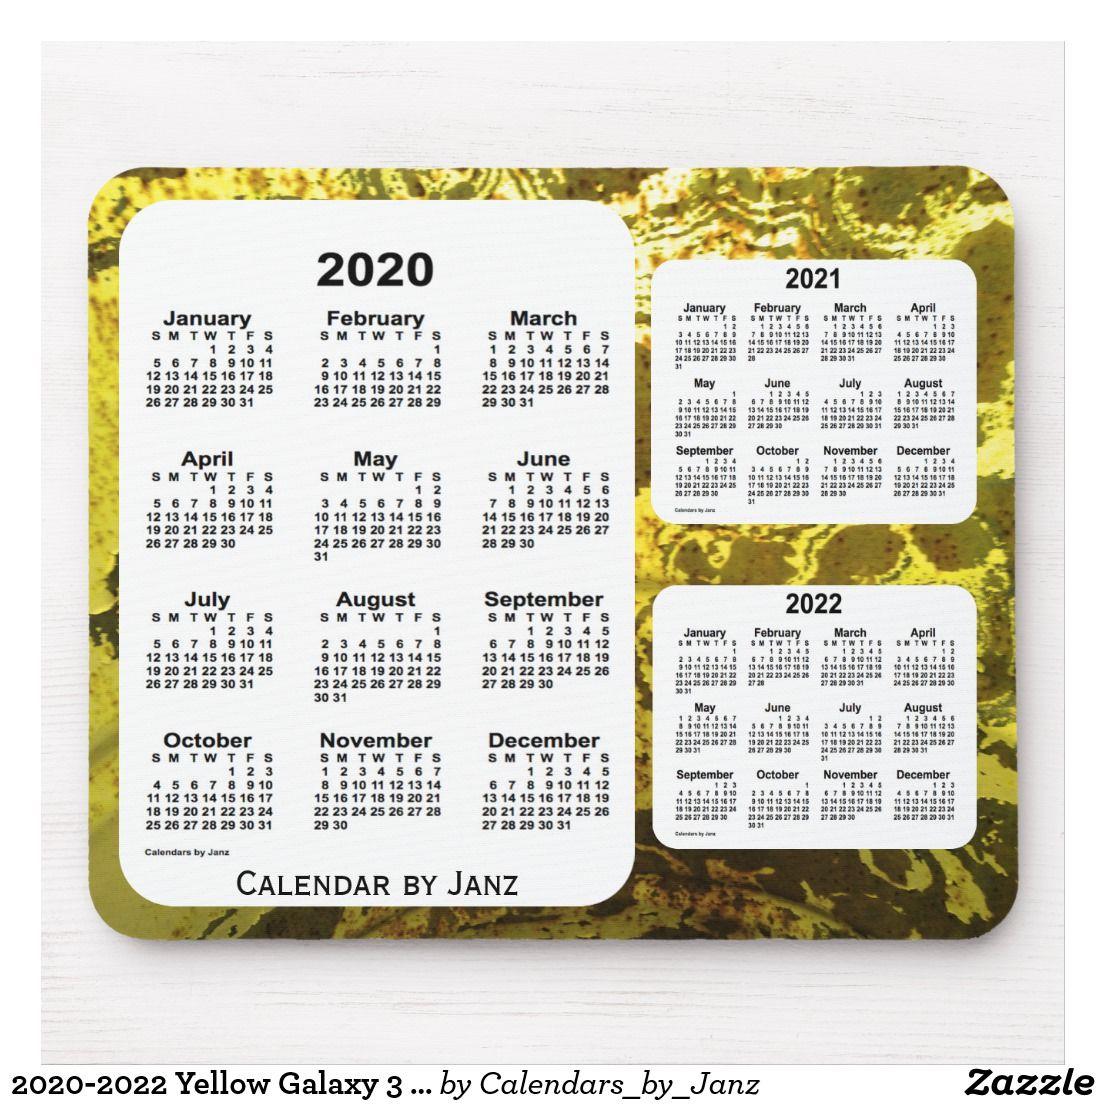 Printable 3 Year Il Caemdar 2020-2022 | Example Calendar ...